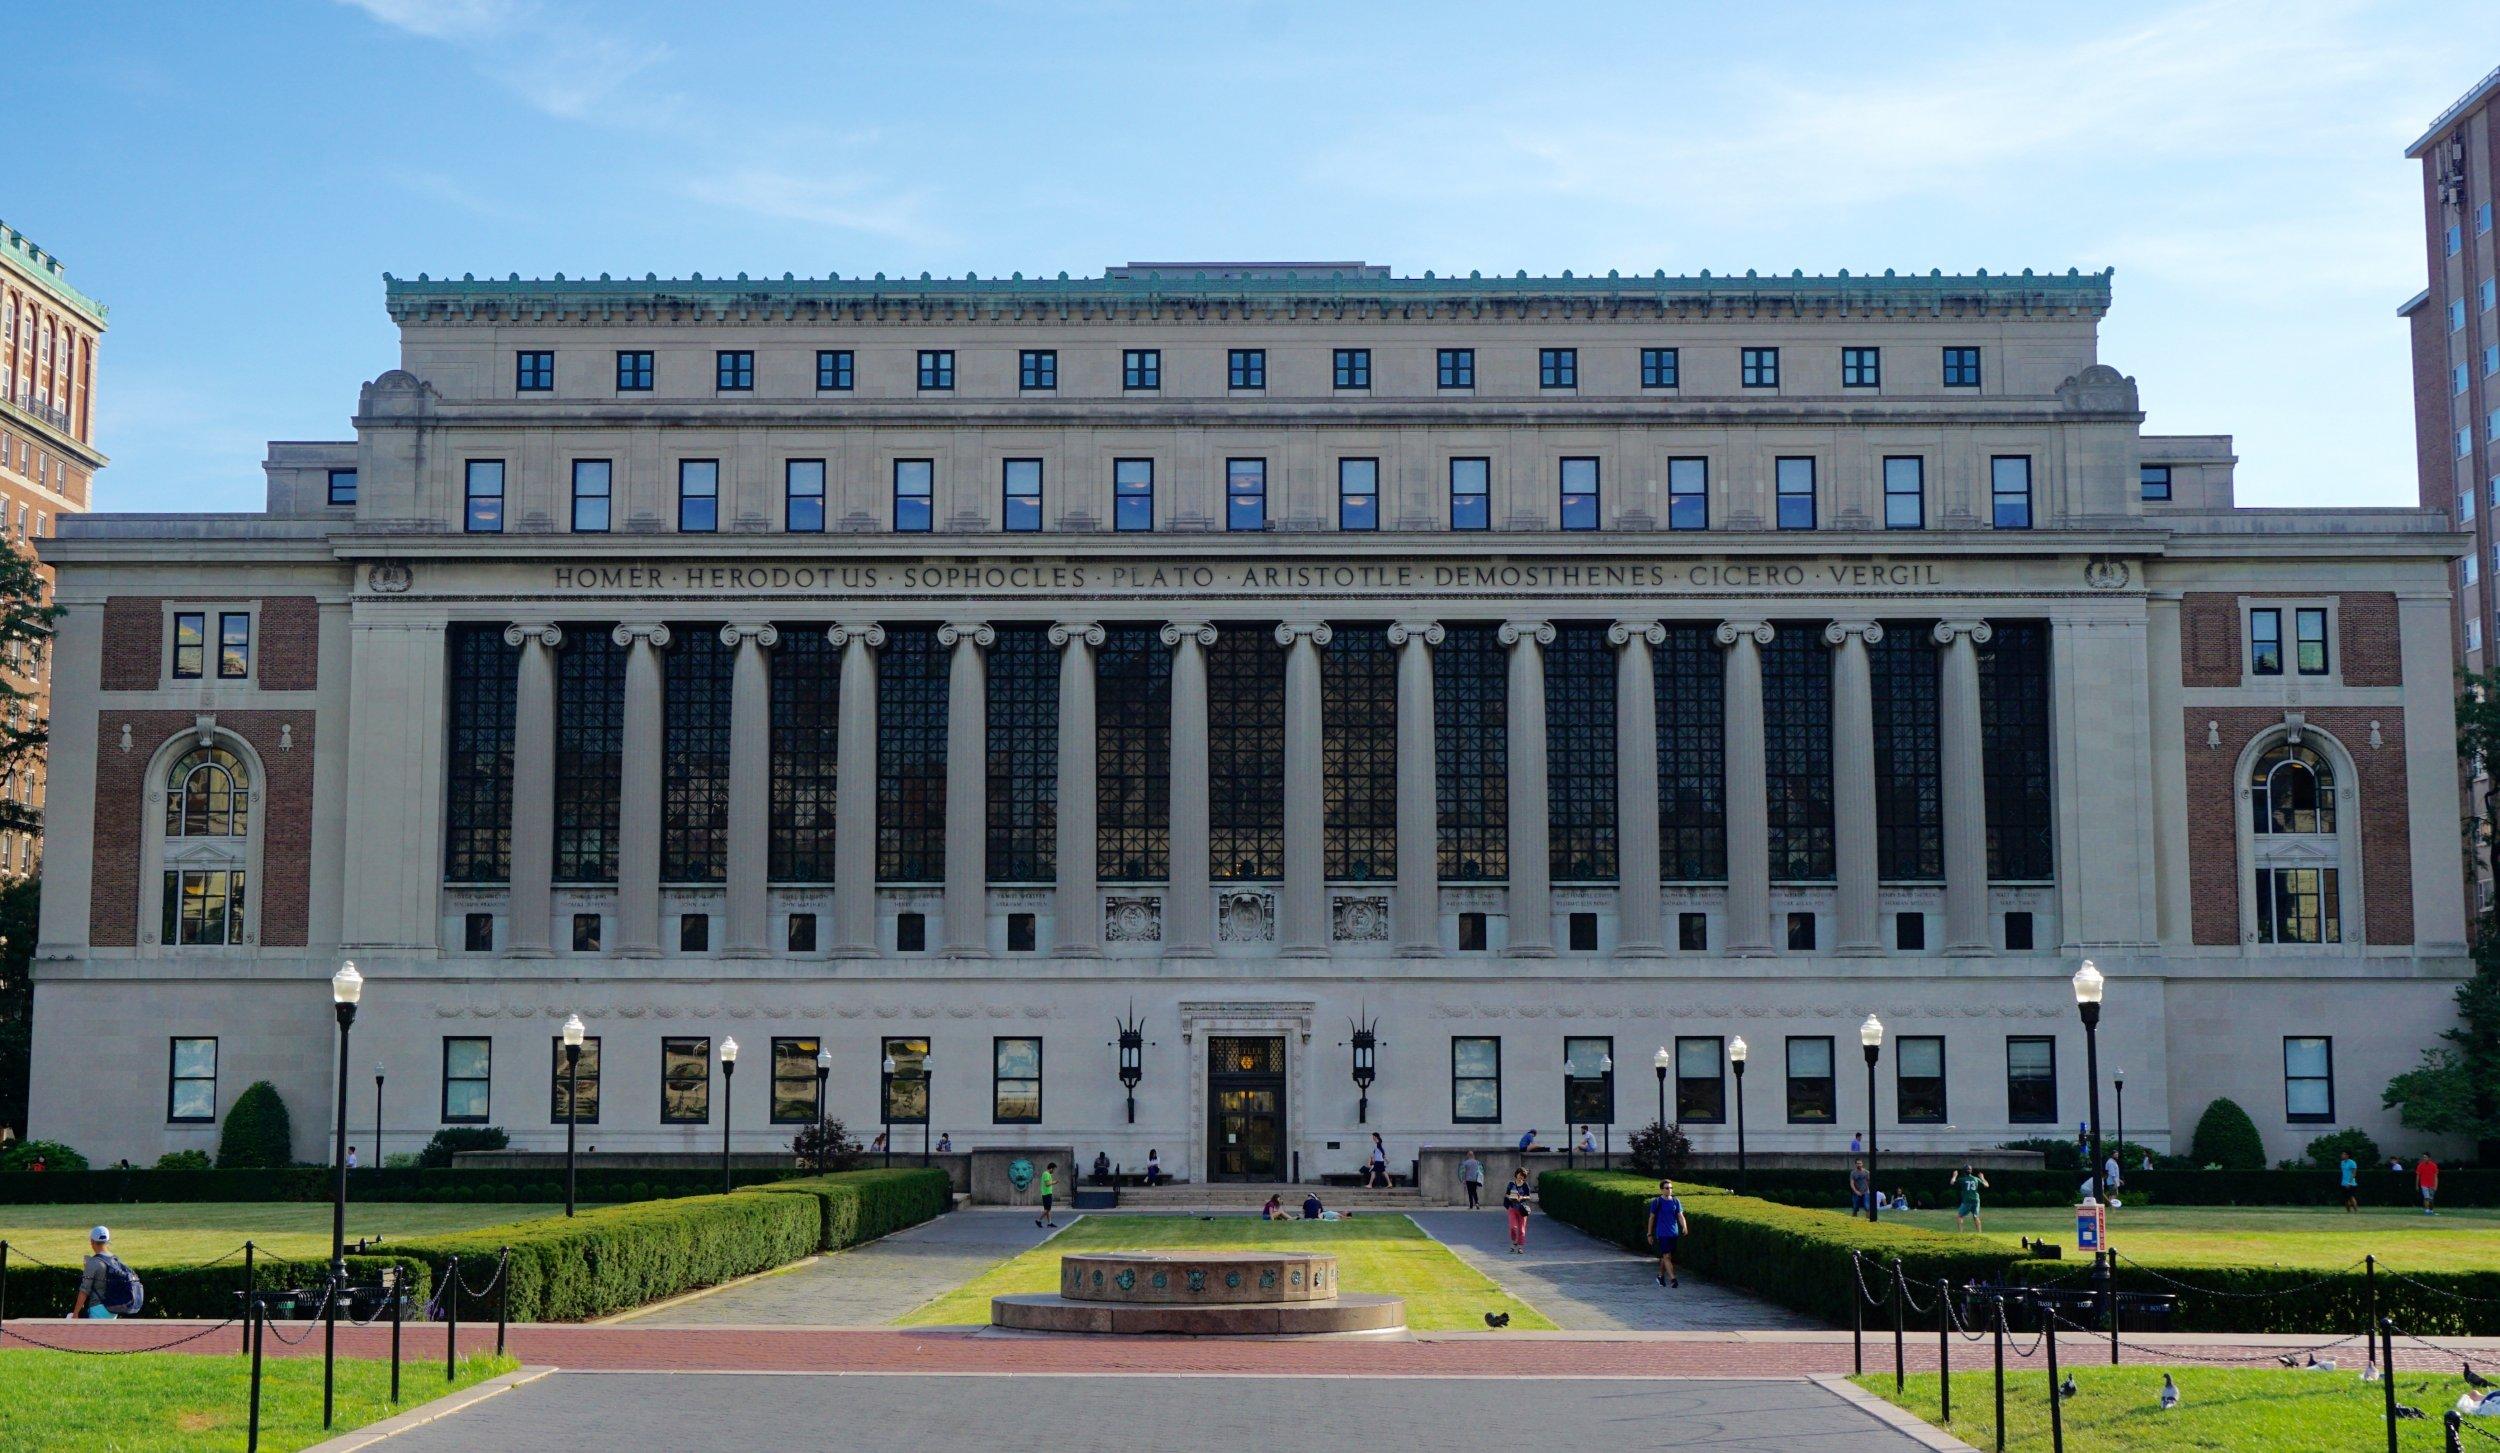 Columbia University hook up piccola città dating scena